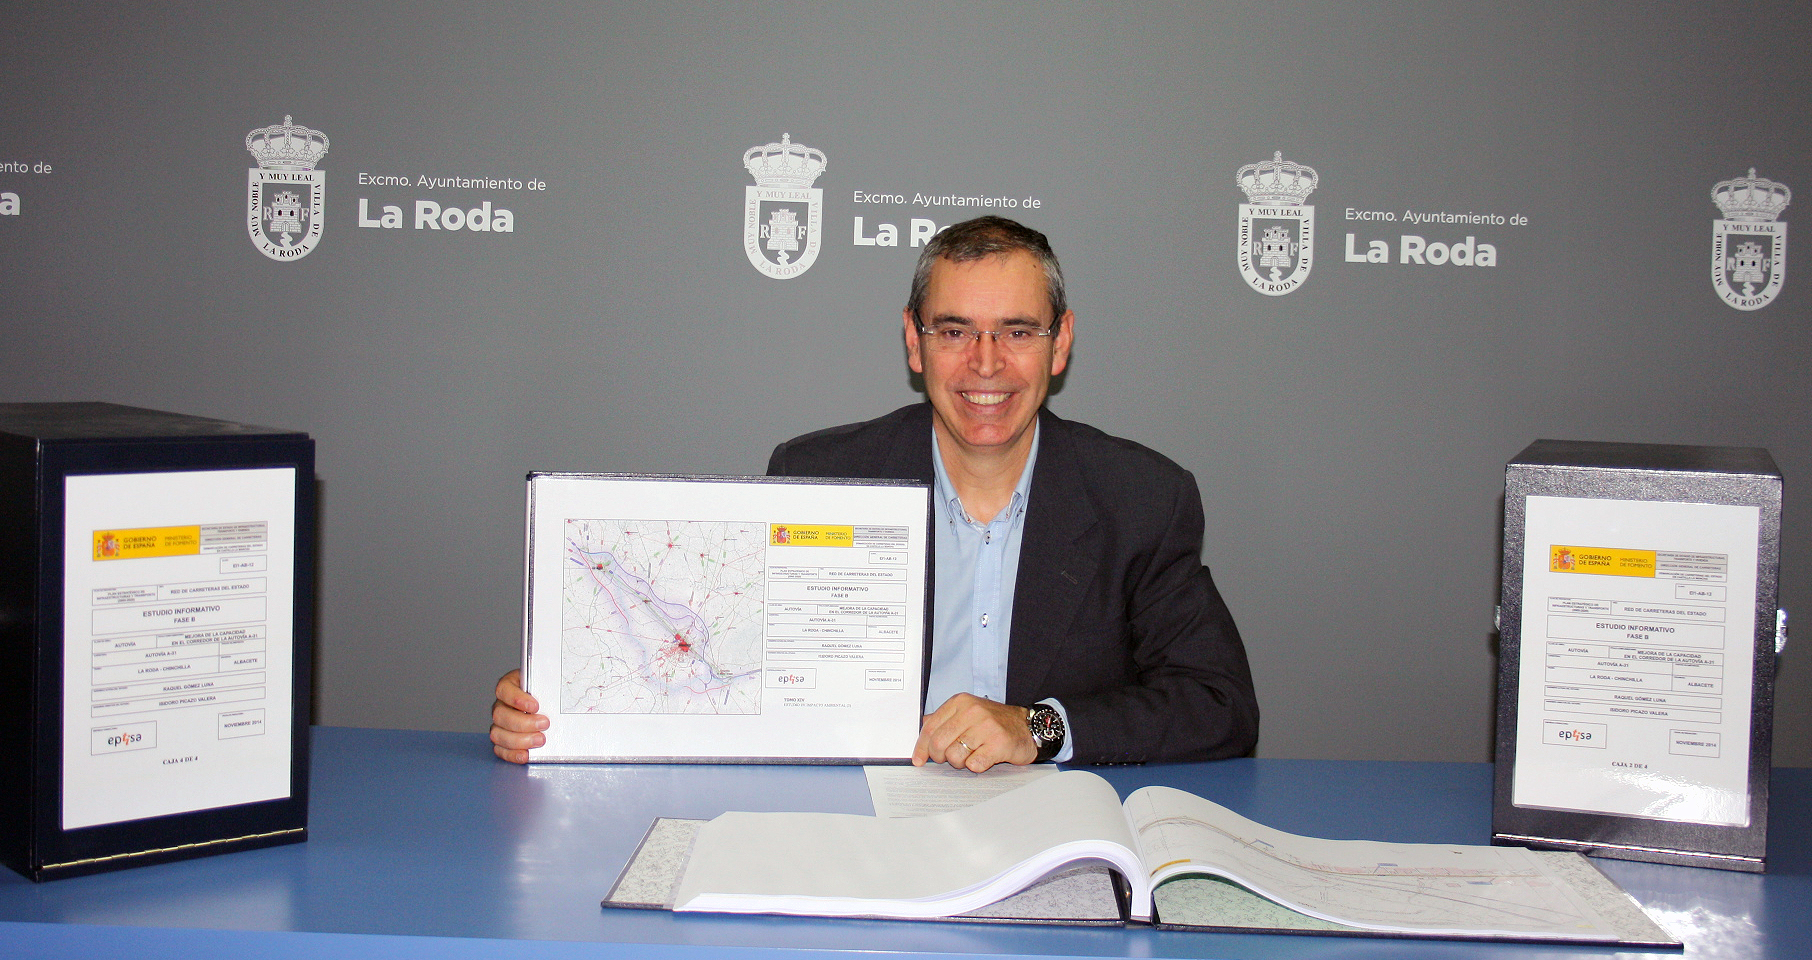 Rp.alcalde Abril 2015 Presentac. EIA En La Roda